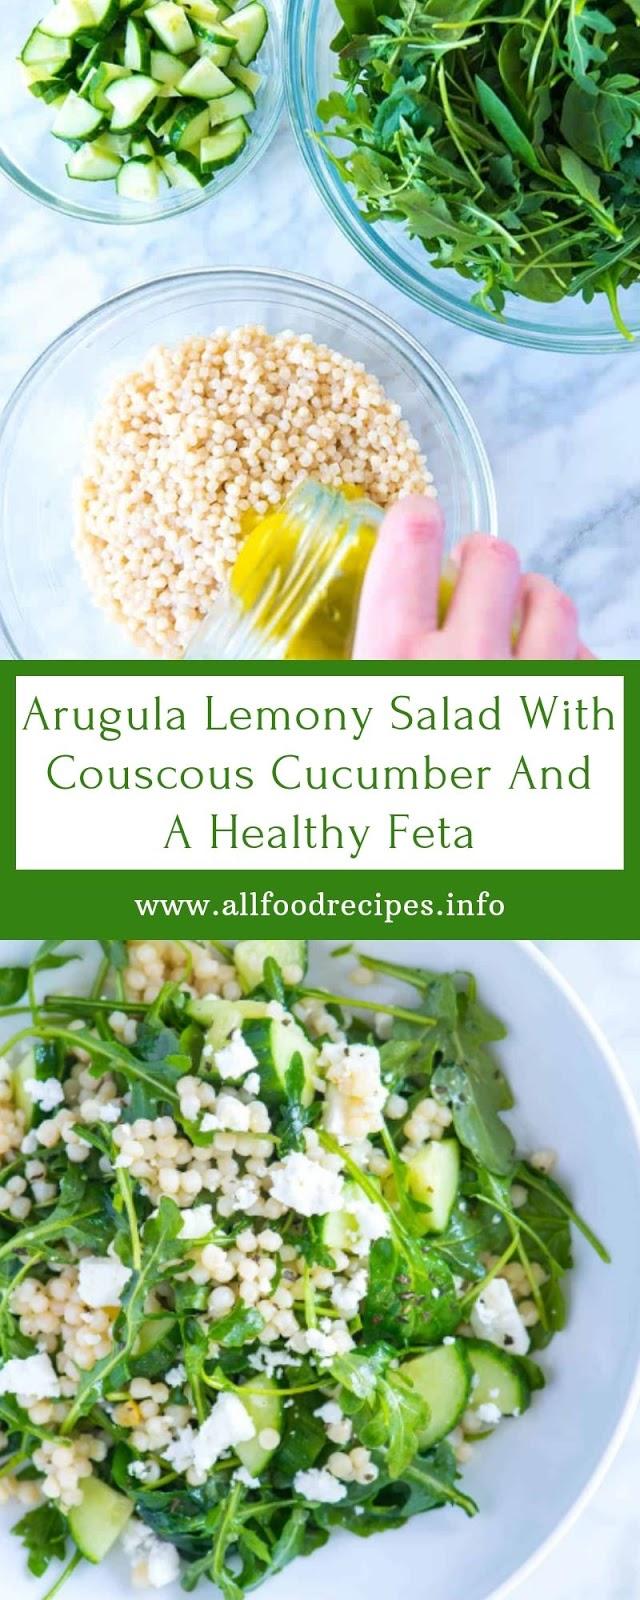 Arugula Lemony Salad With Couscous Cucumber And A Healthy Feta